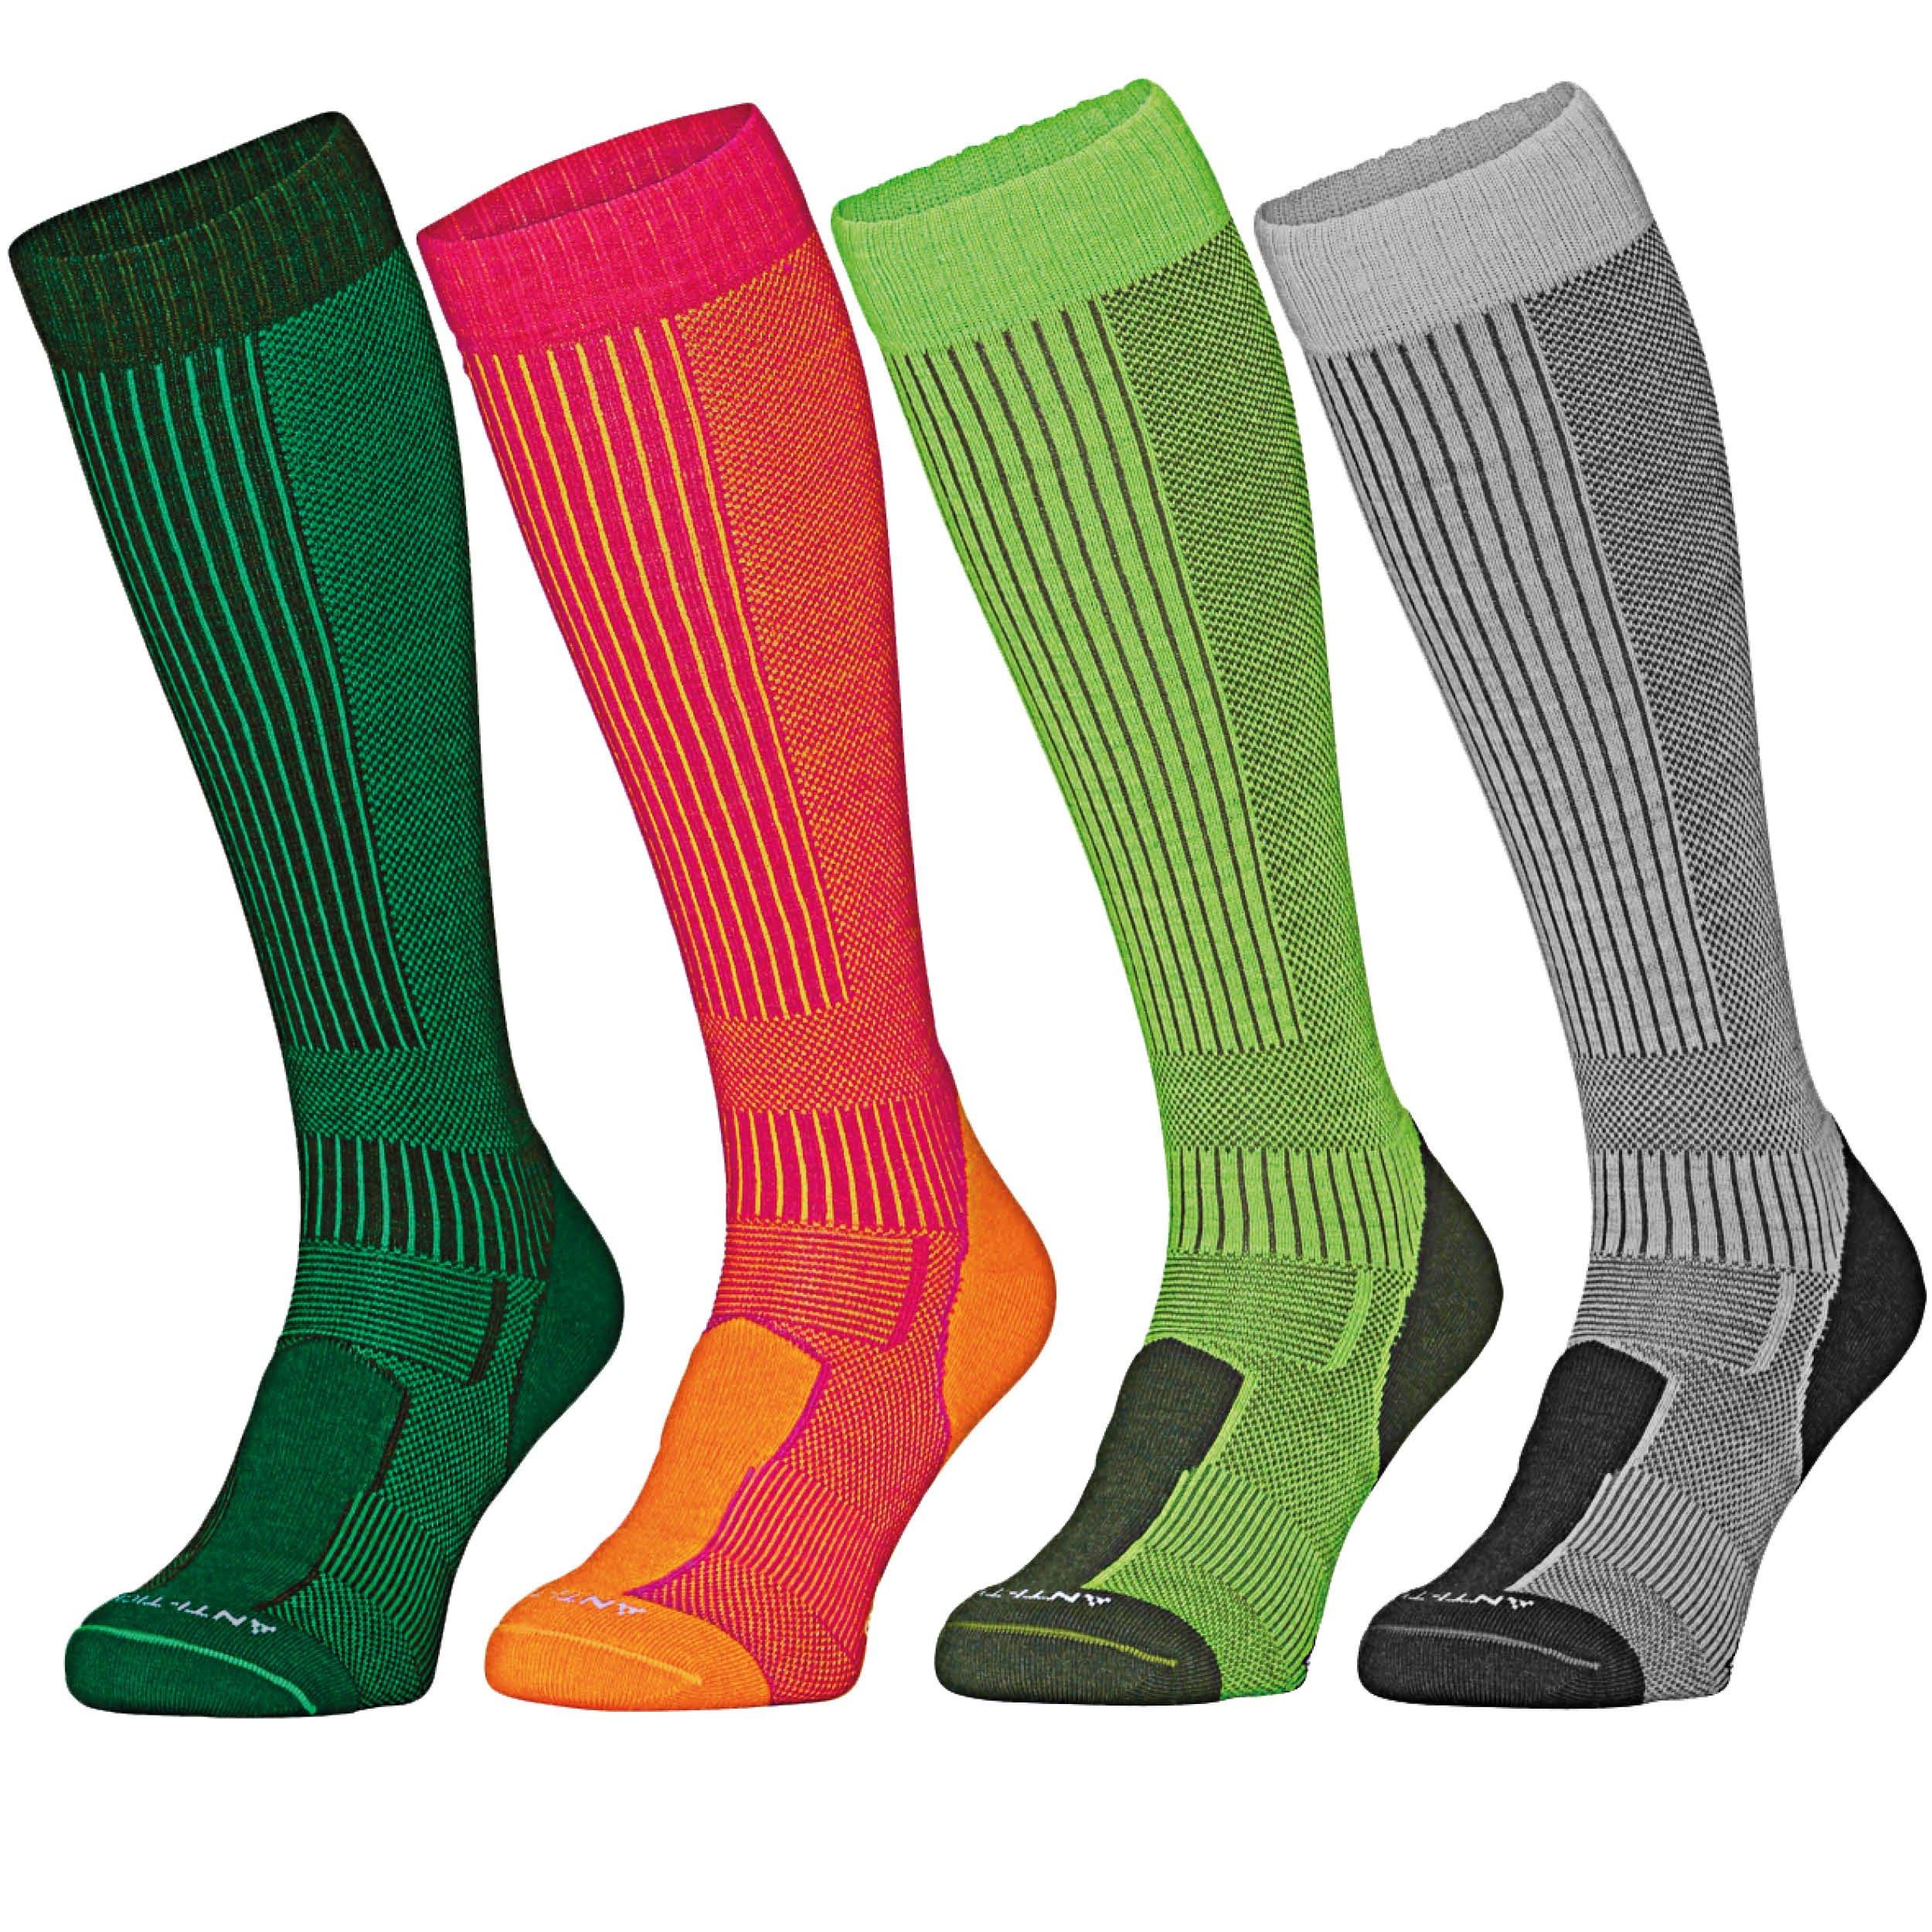 DANISH ENDURANCE Anti-Tick Merino Wool Outdoor Socks (Light Grey 1 Pair, US Women 11-13 // US Men 9.5-12.5)